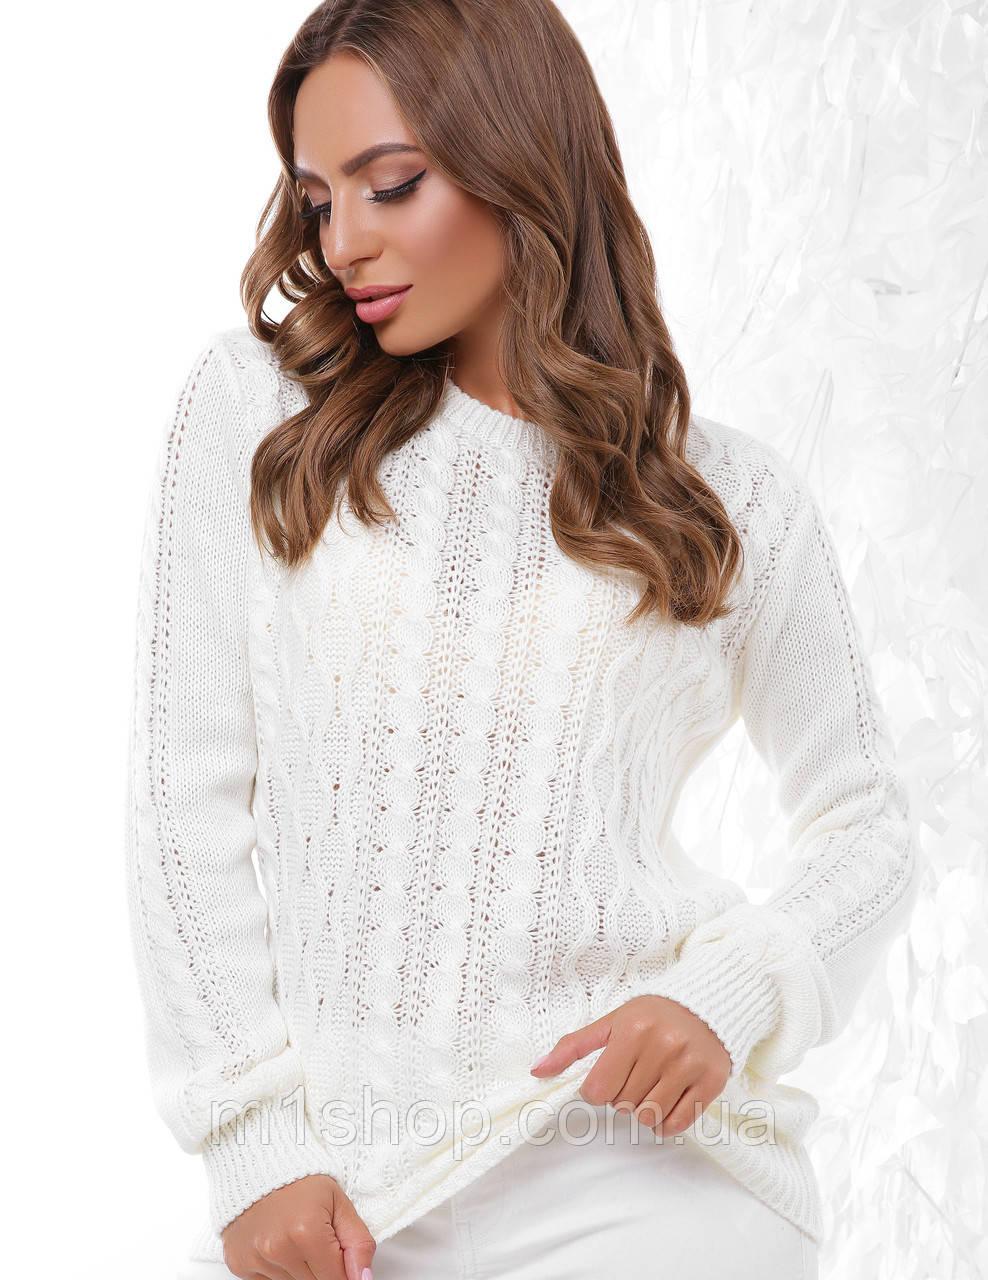 Женский шерстяной вязаный свитер (158 mrs)